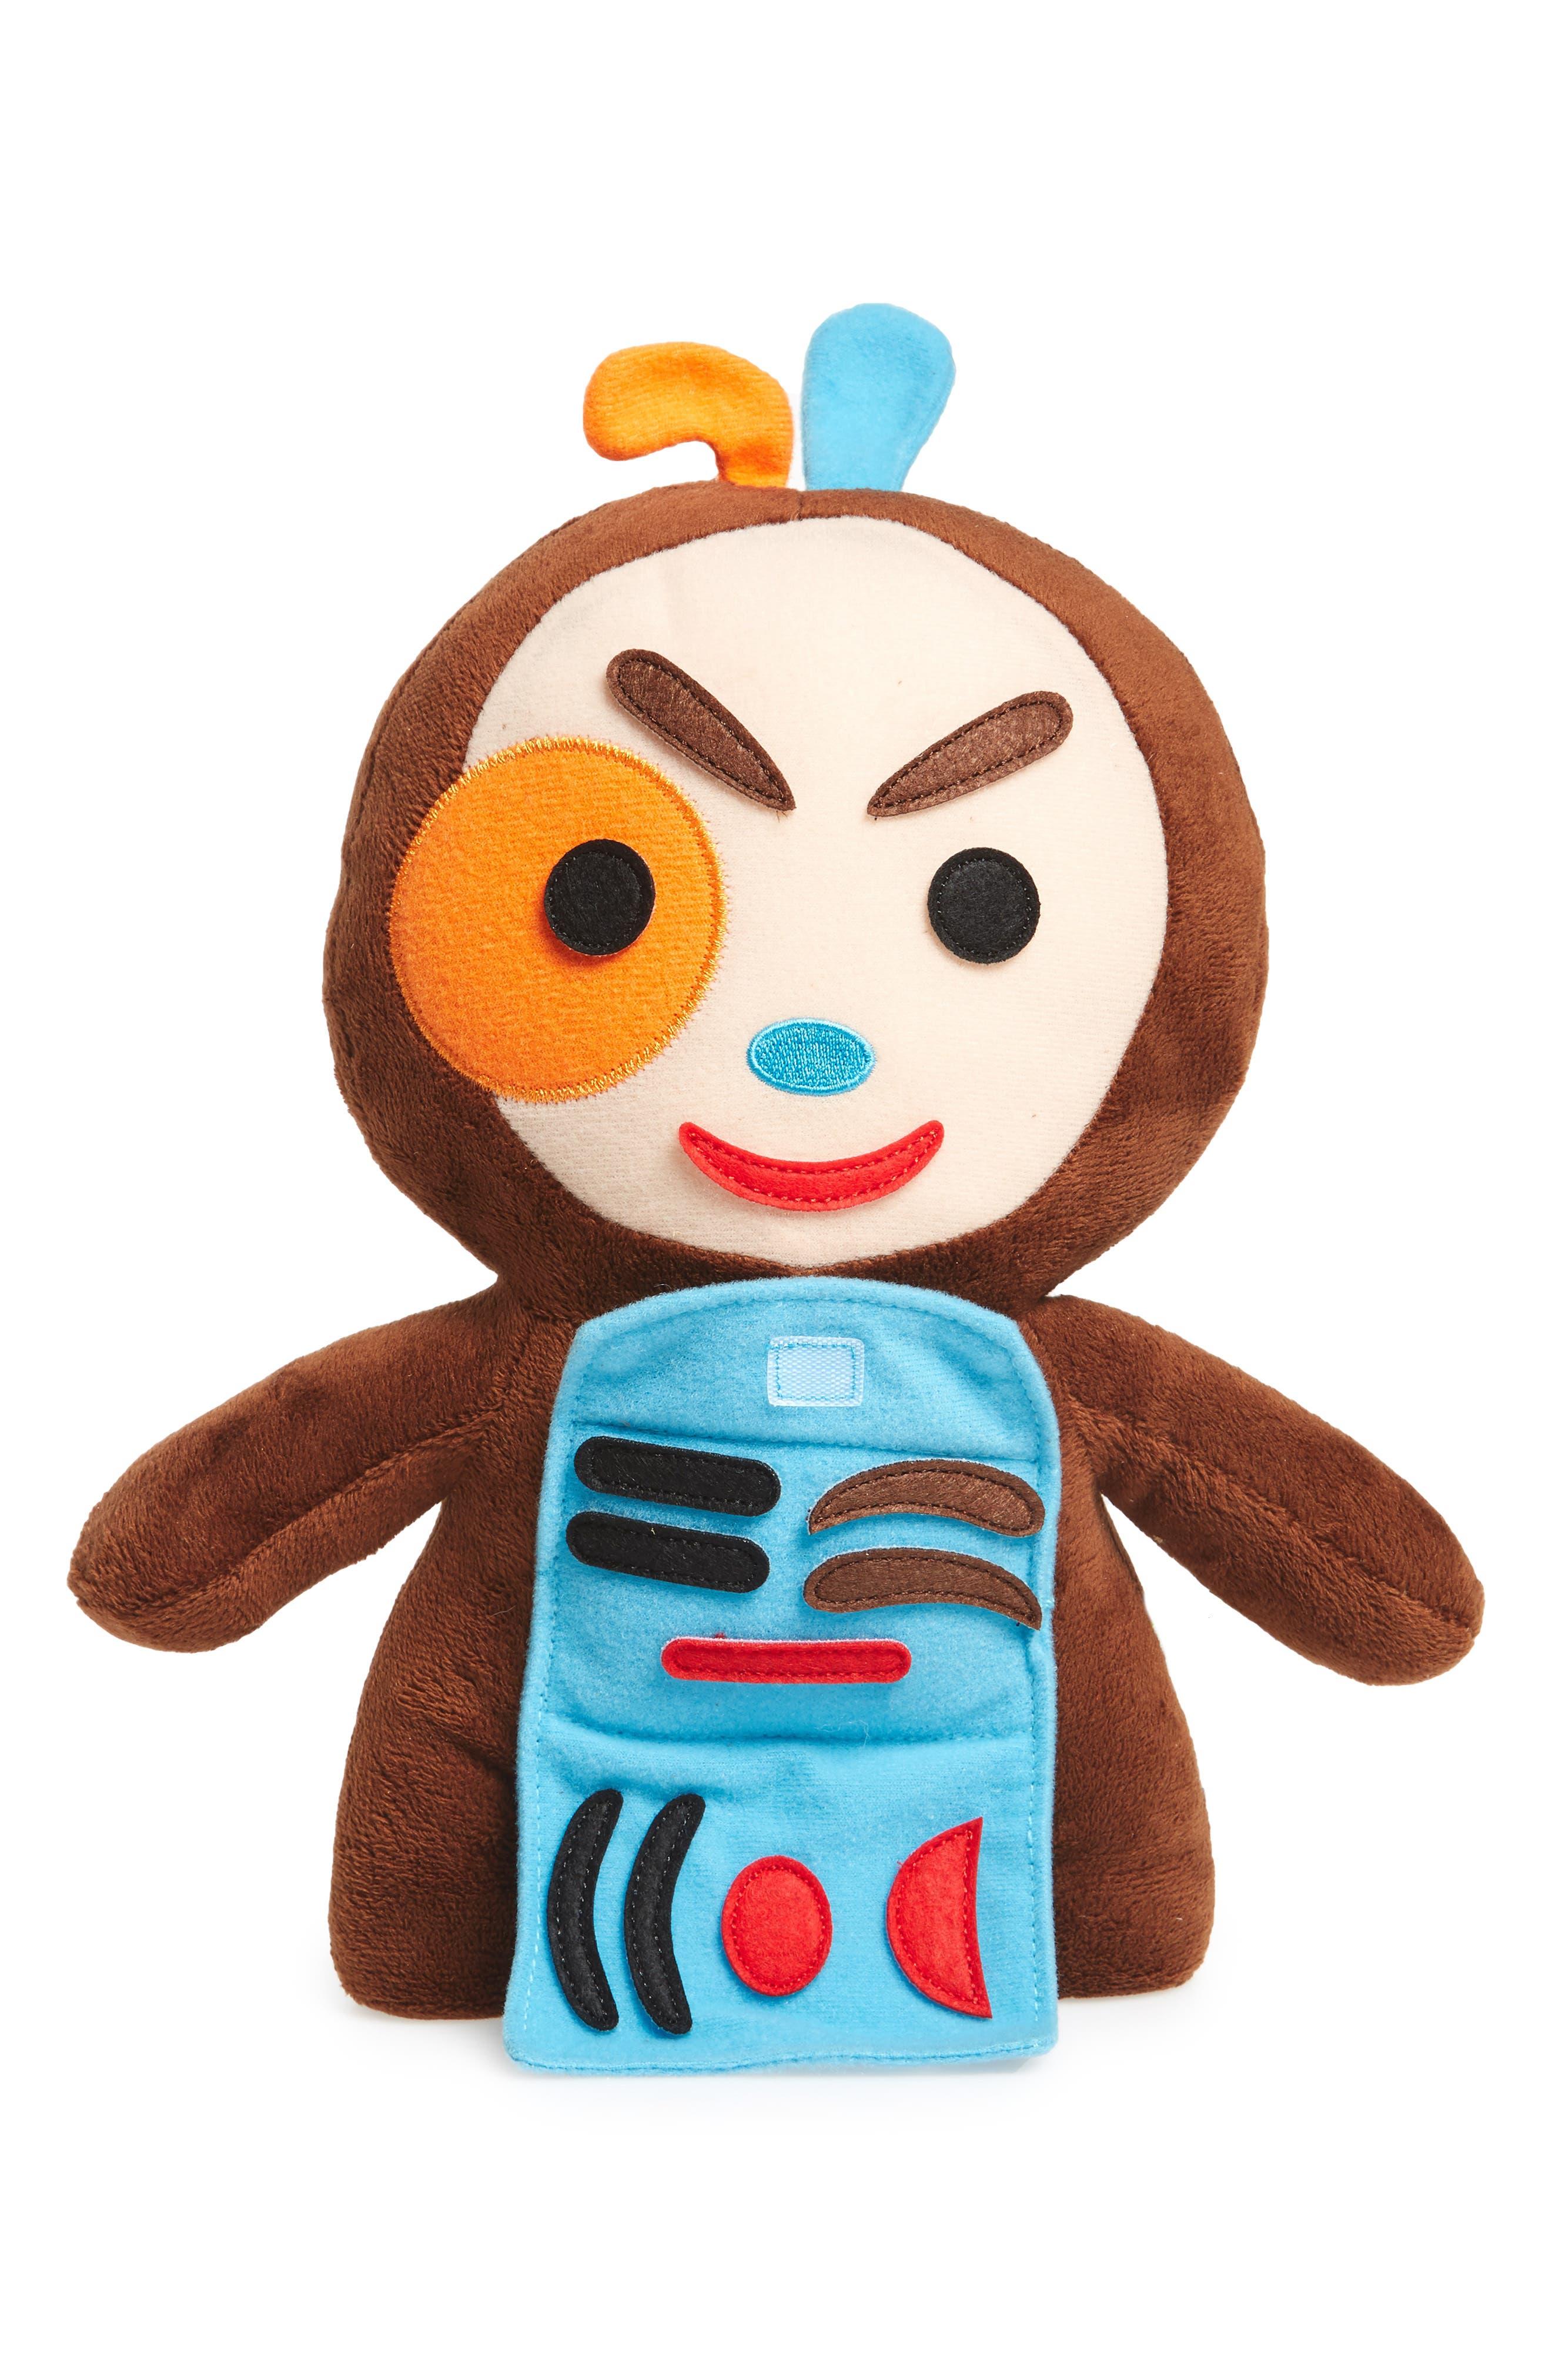 Feelings Friend Stuffed Doll,                             Alternate thumbnail 2, color,                             Brown